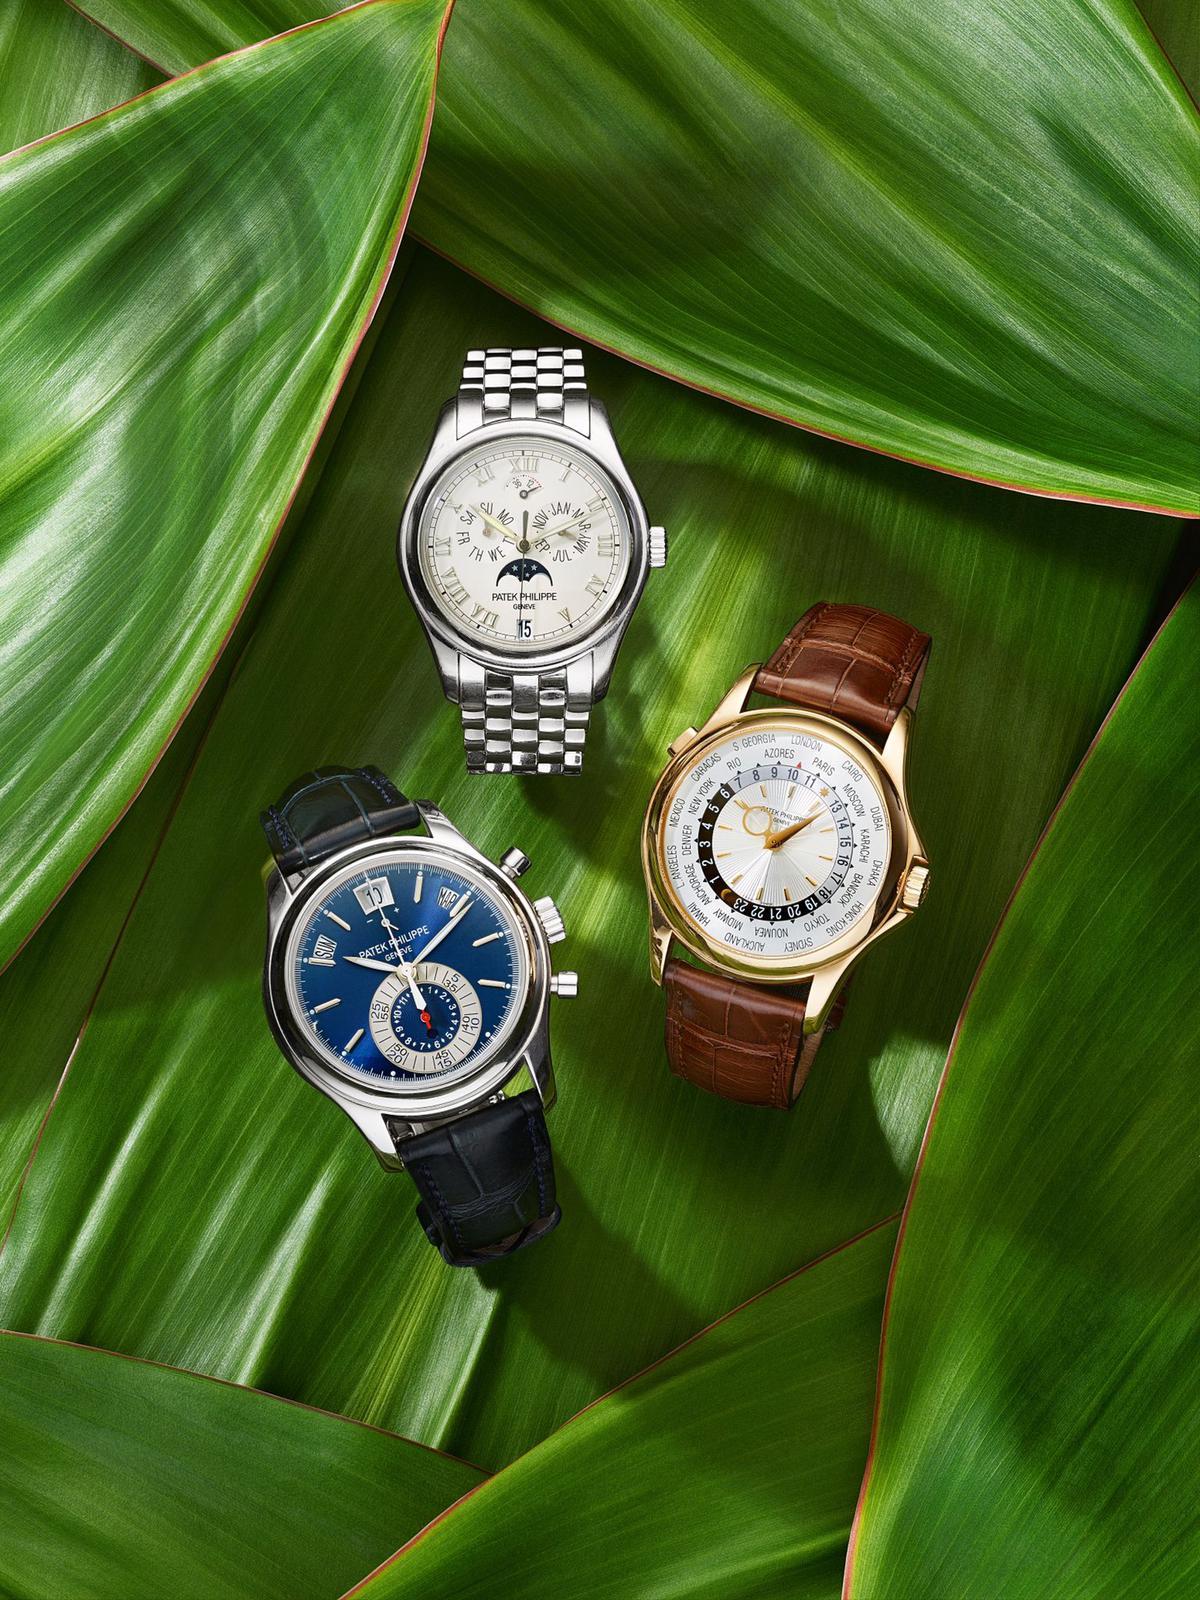 Fine Watches and Clocks by Bonhams - MondaniWeb